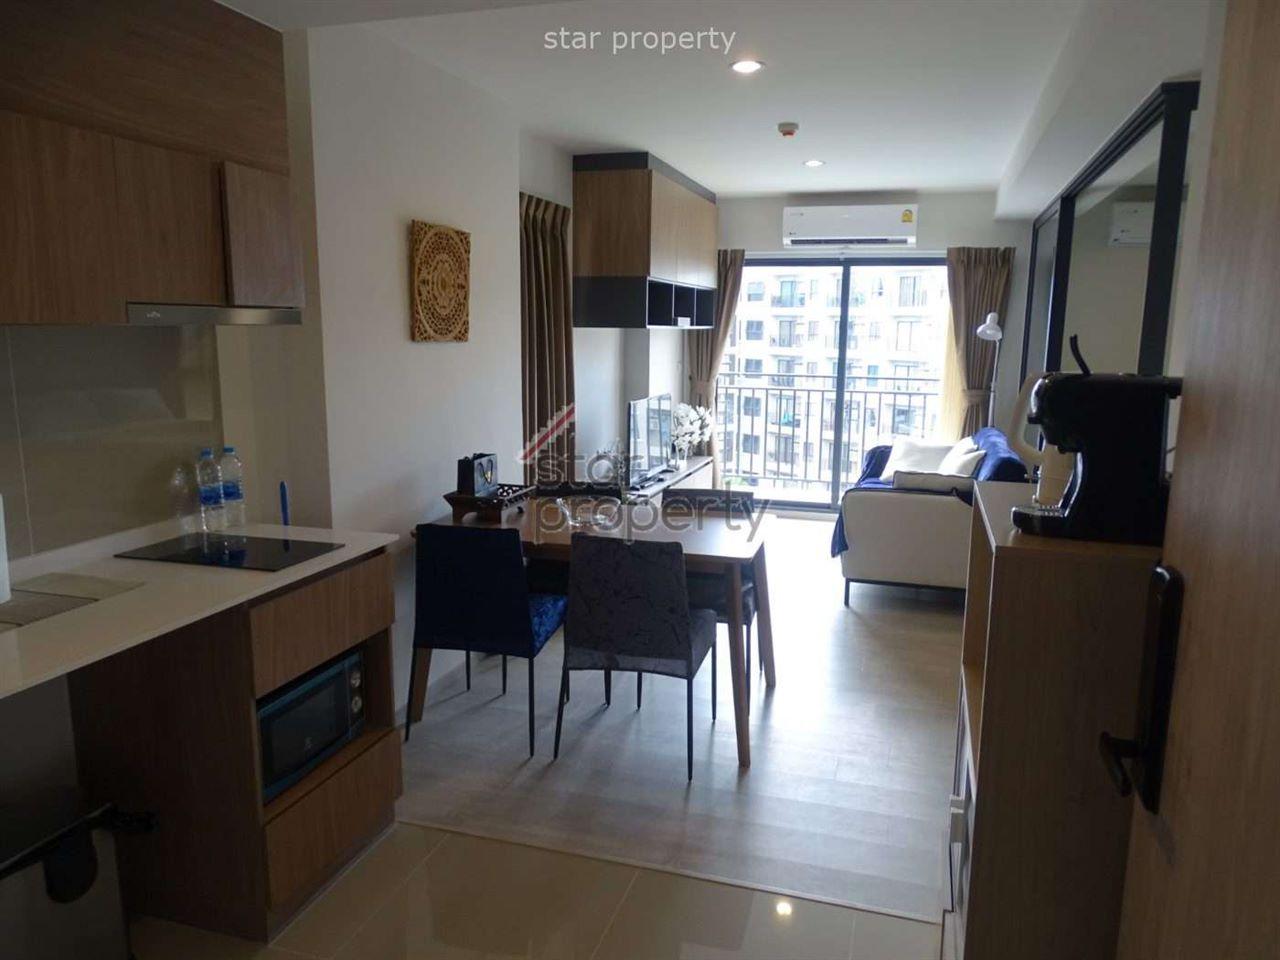 Stunning Condominium for Rent in center of Hua Hin at La Casita Hua Hin